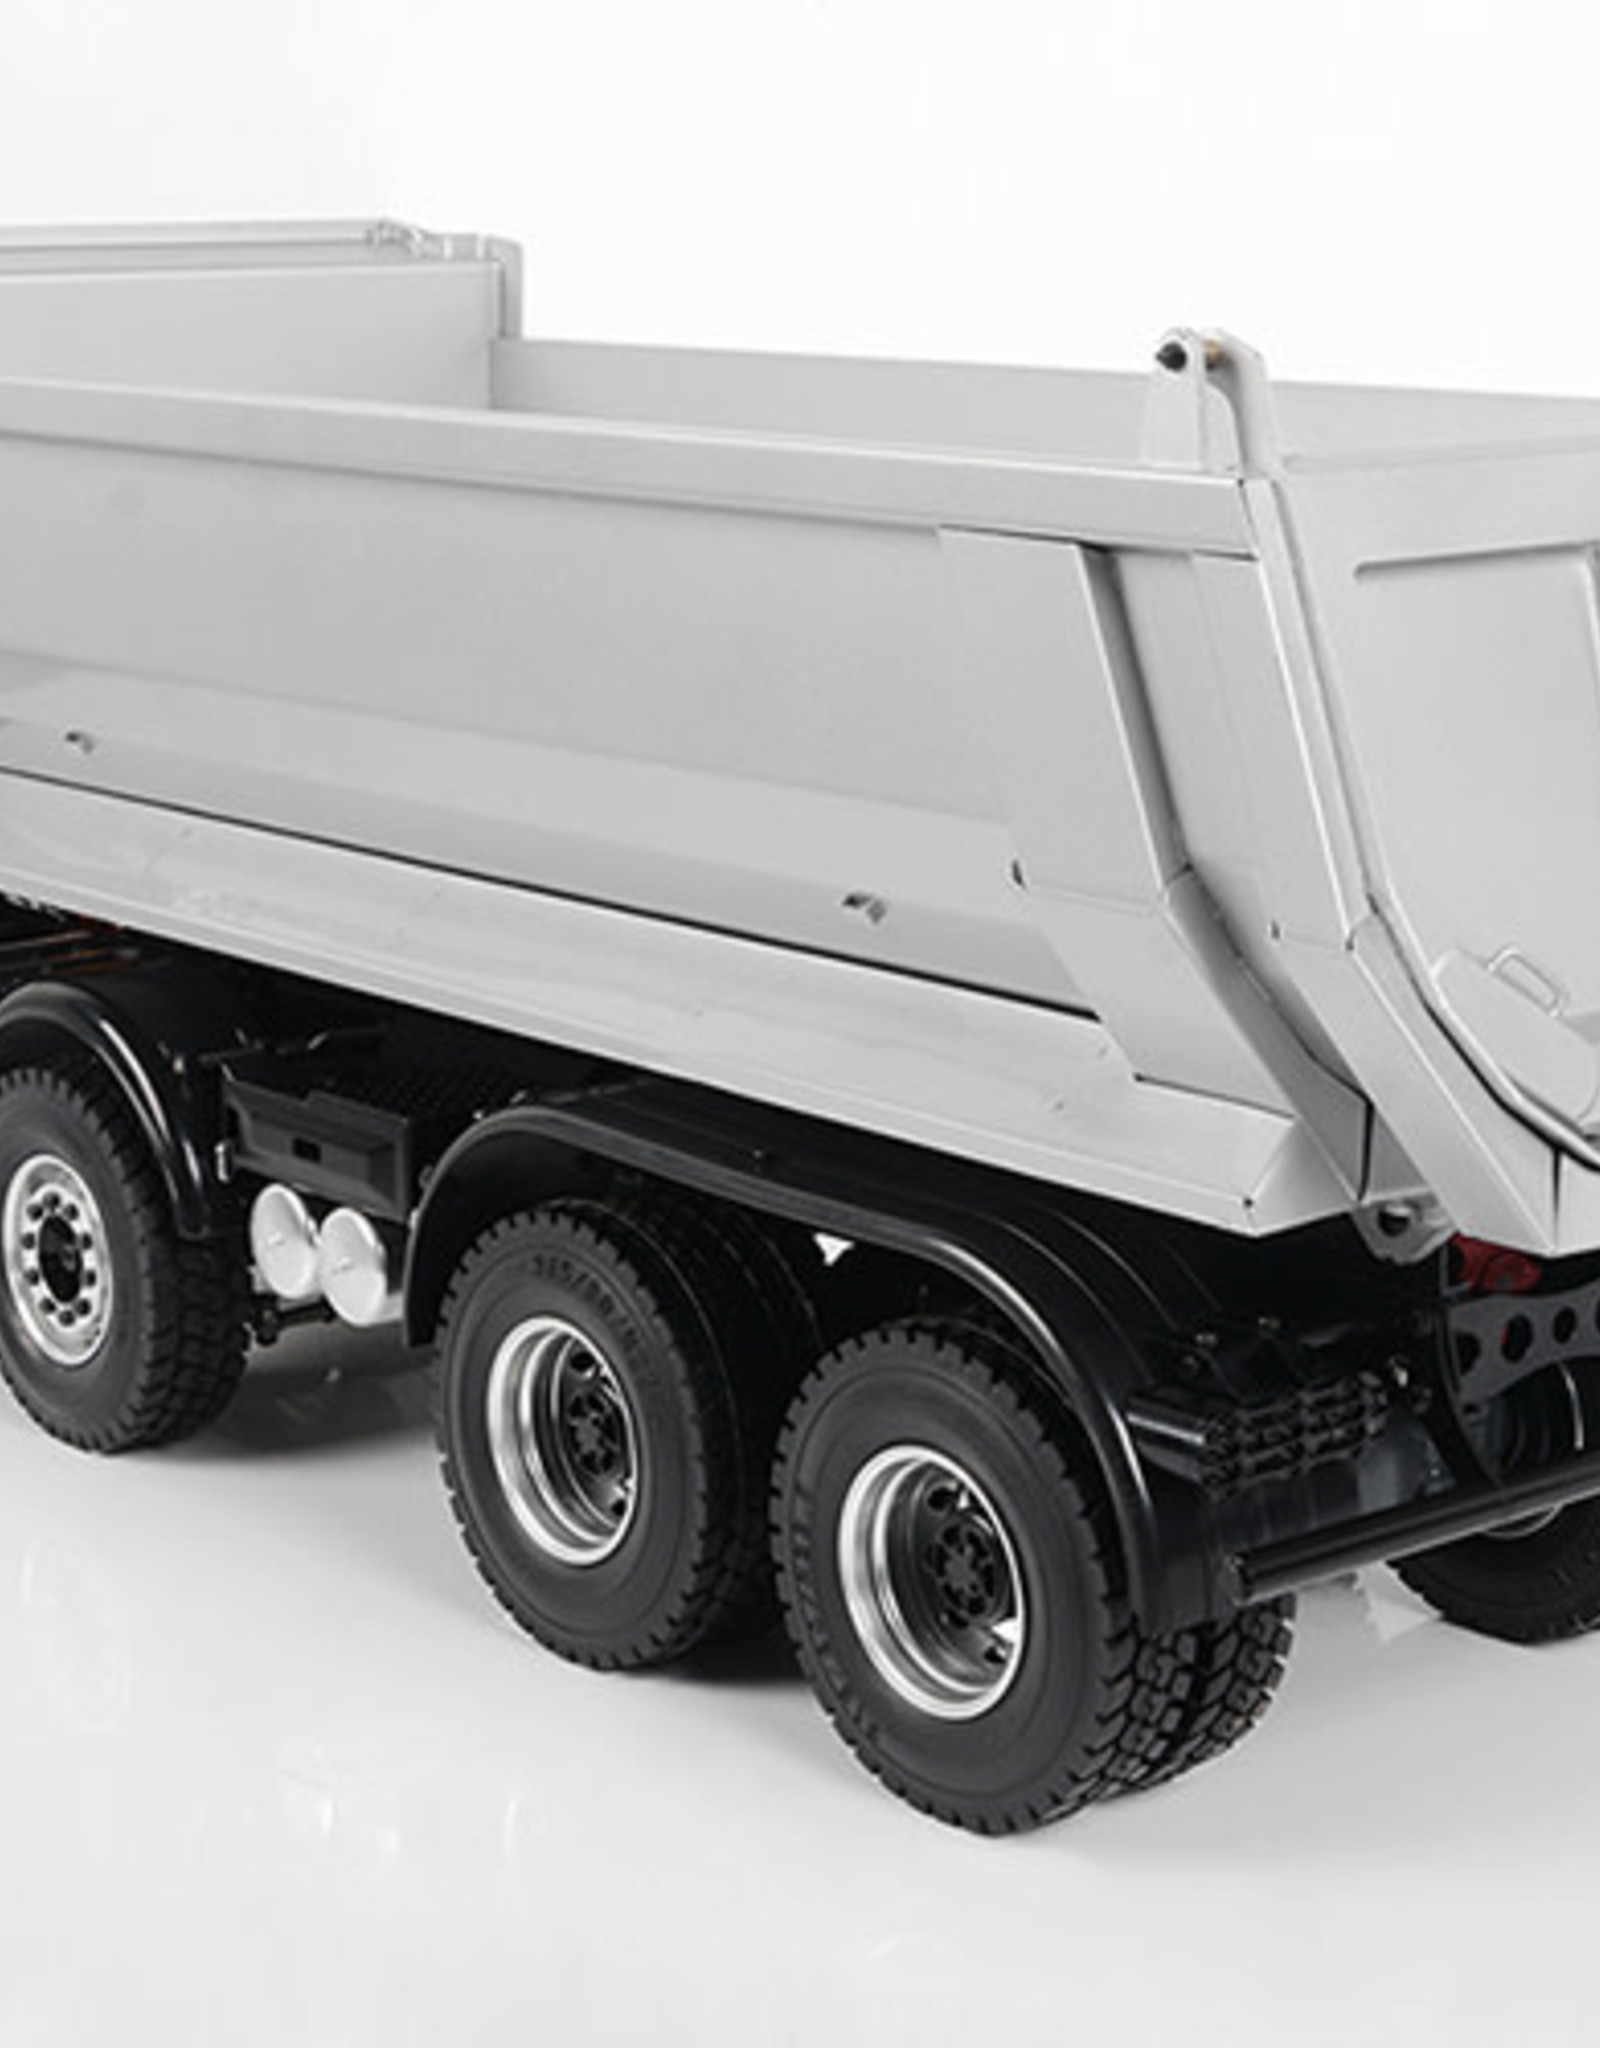 RC4WD RC4D-VV-JD00017 1/14 8x8 Armageddon Hydraulic Dump Truck (FMX)8x8 Armageddon Hydraulic Dump Truck (FMX)